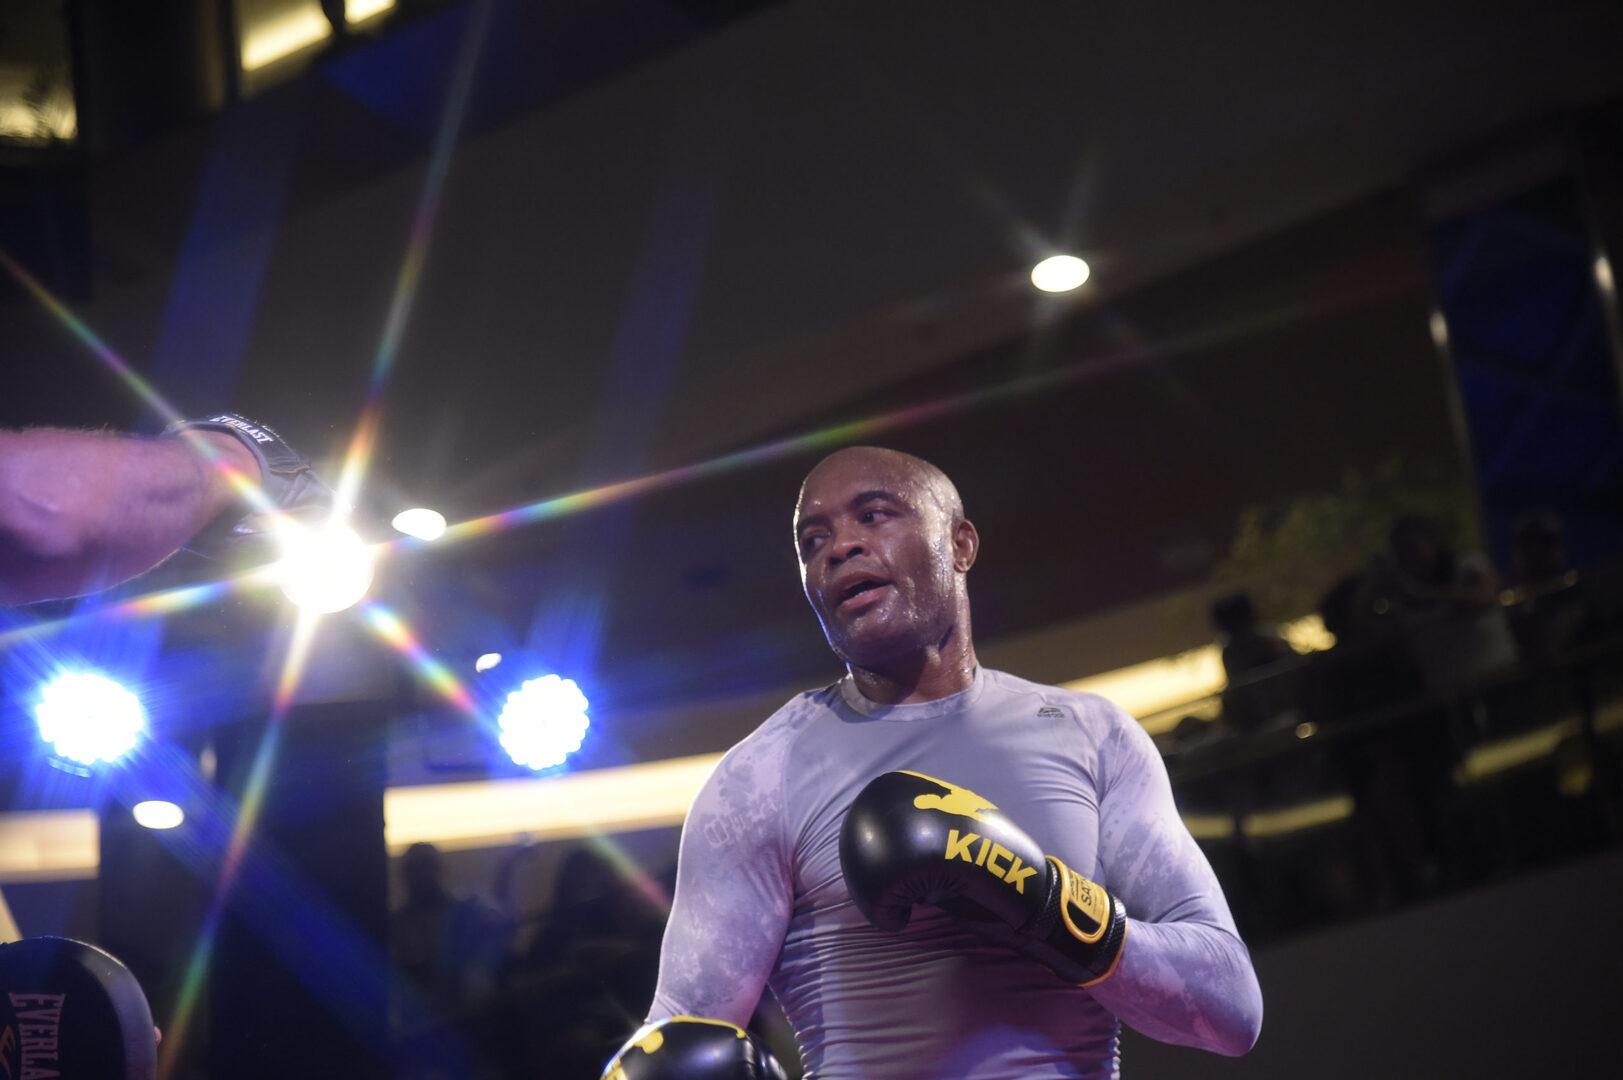 Anderson Silva's Son Kalyl Scores 11-Second Switch Kick KO In Kickboxing Debut